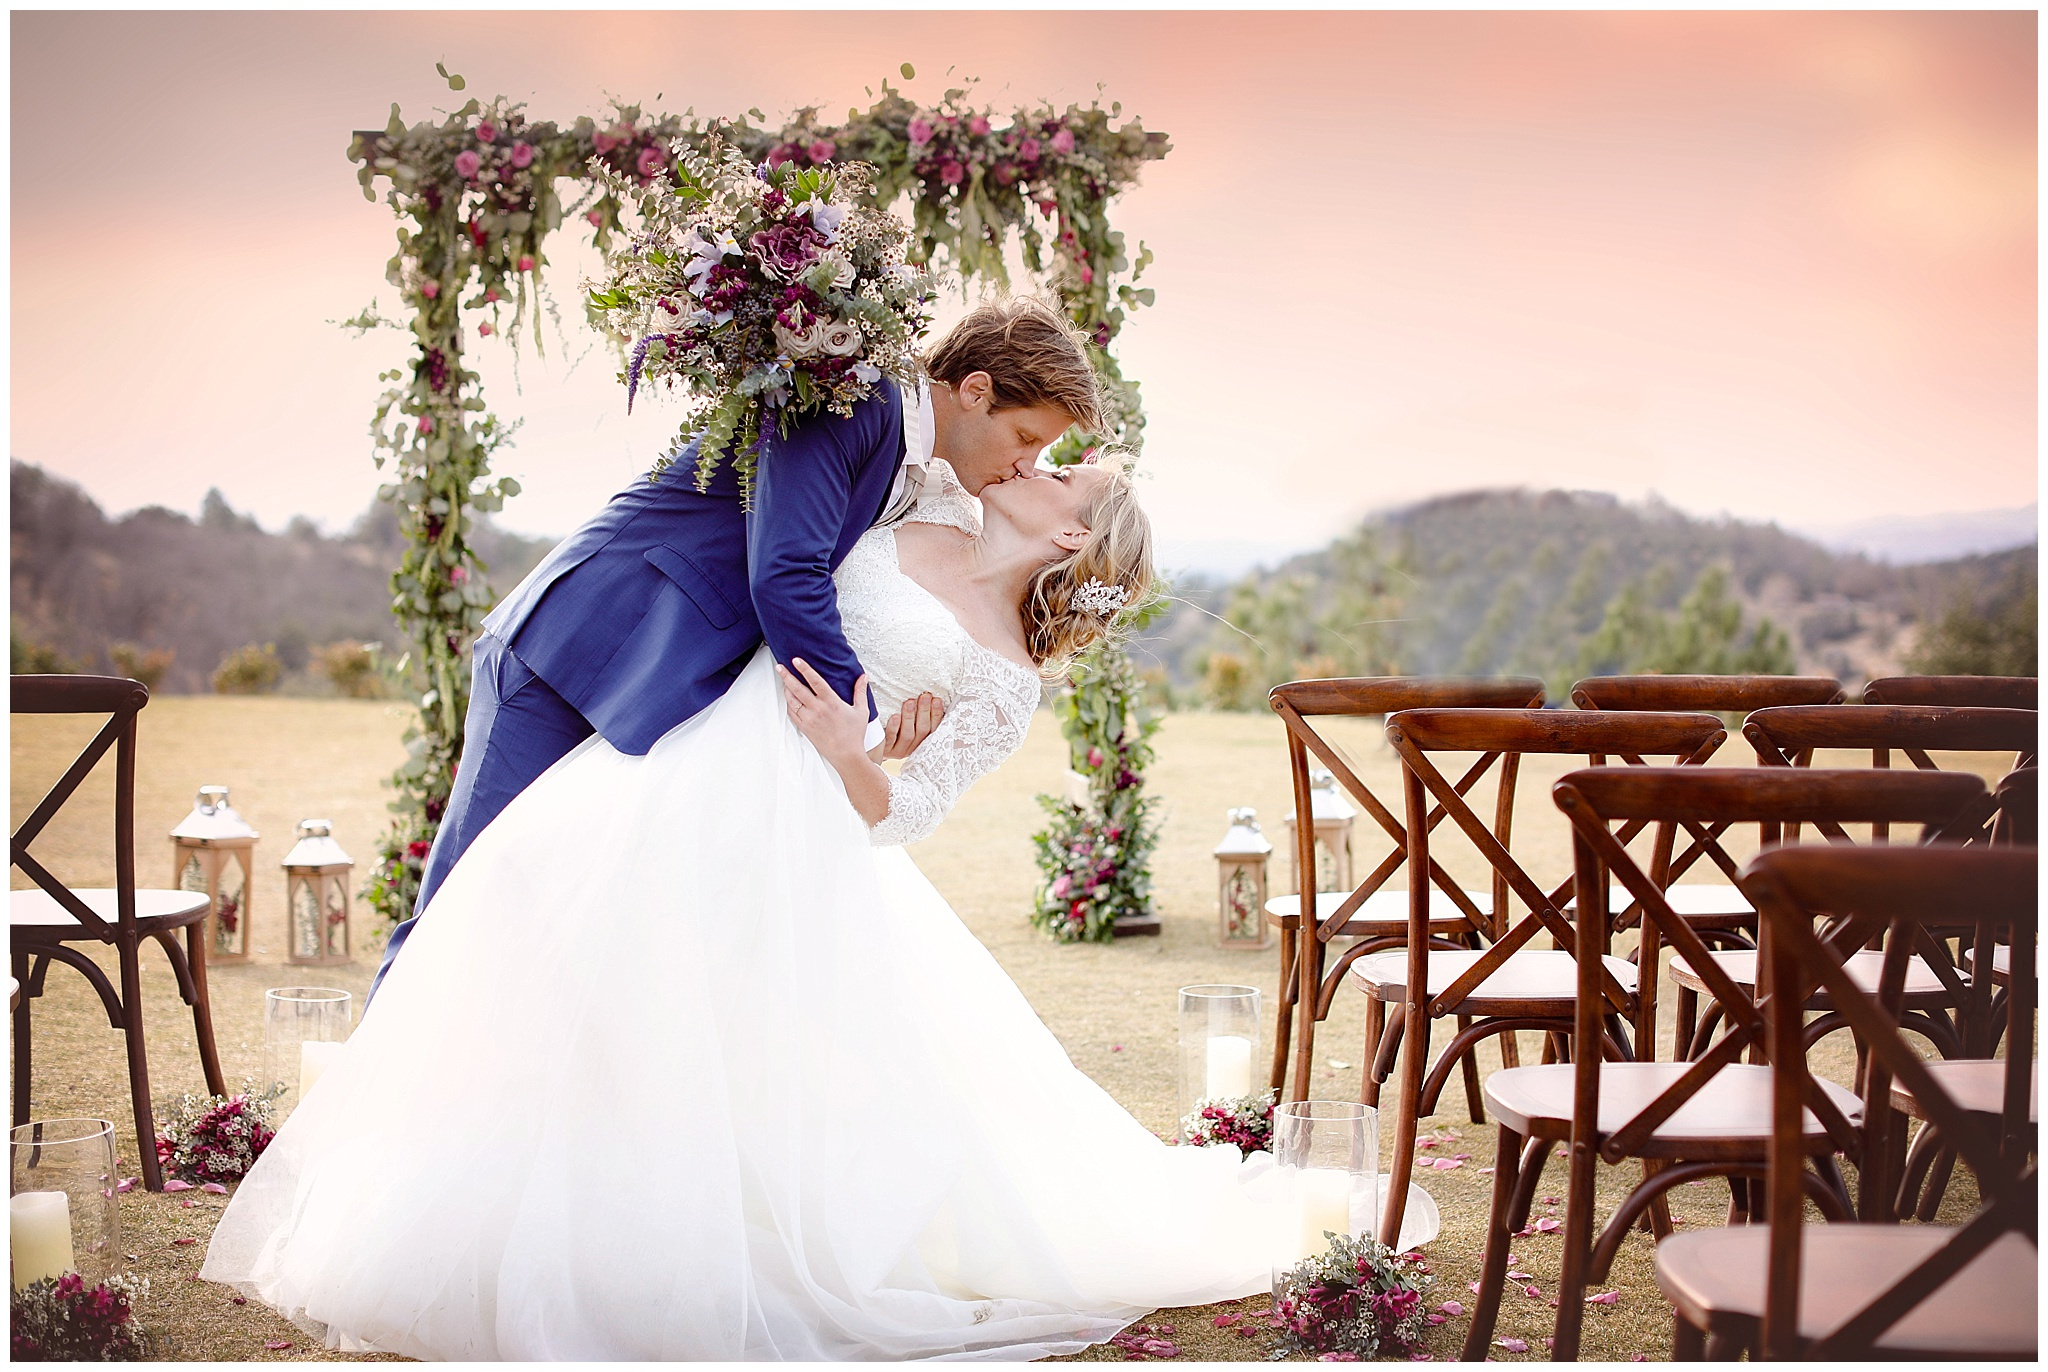 Wedding Photography Southern California: Three Unique Wedding Venues In Southern California By San